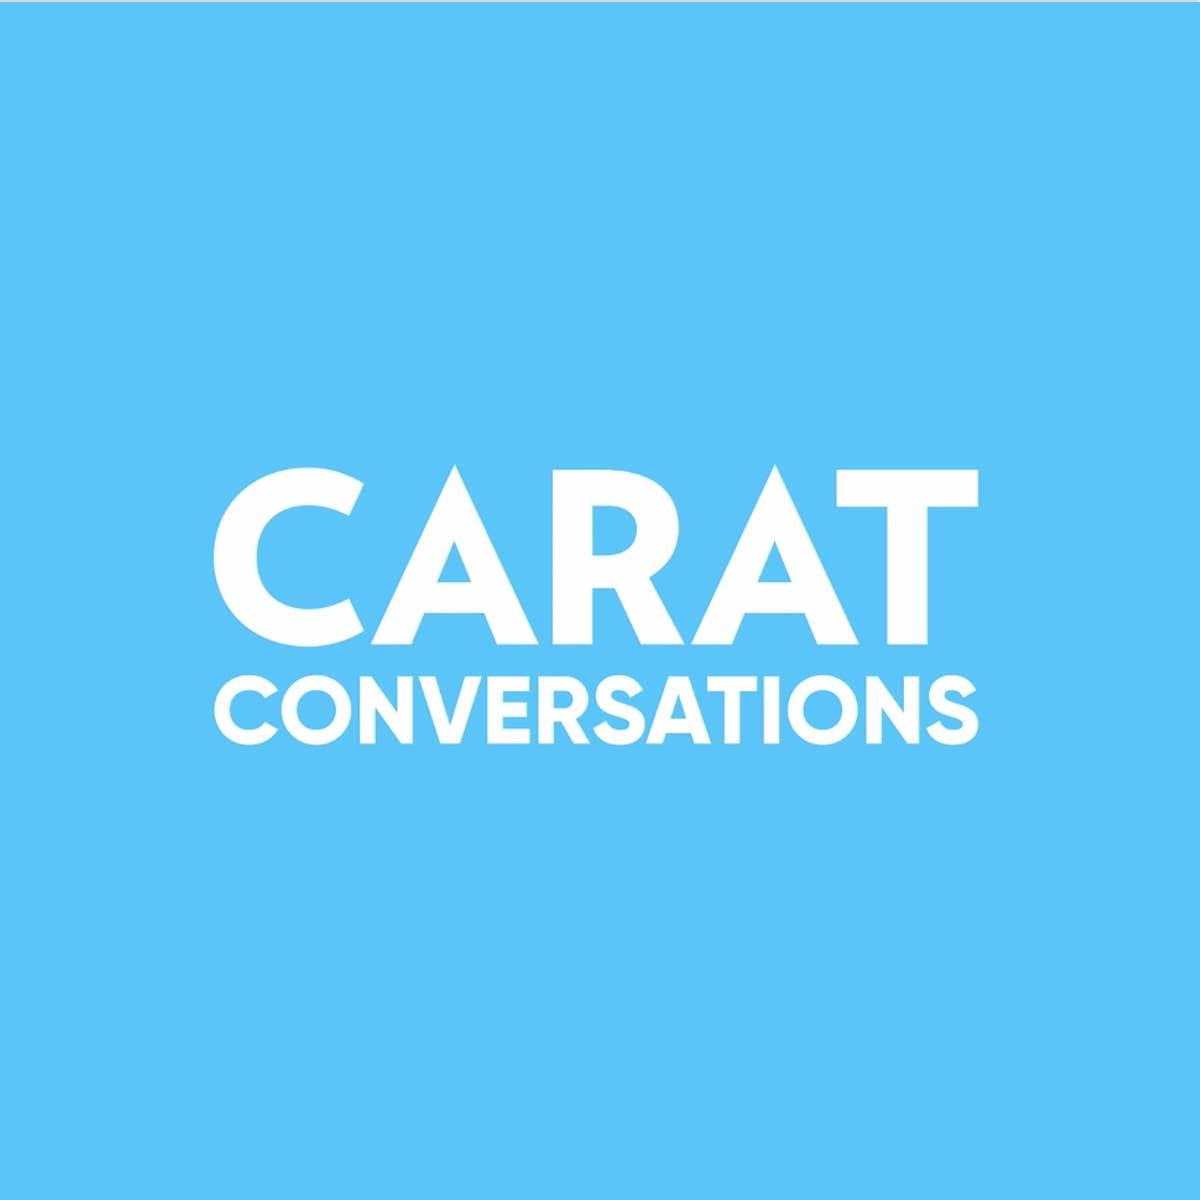 Carat Conversations